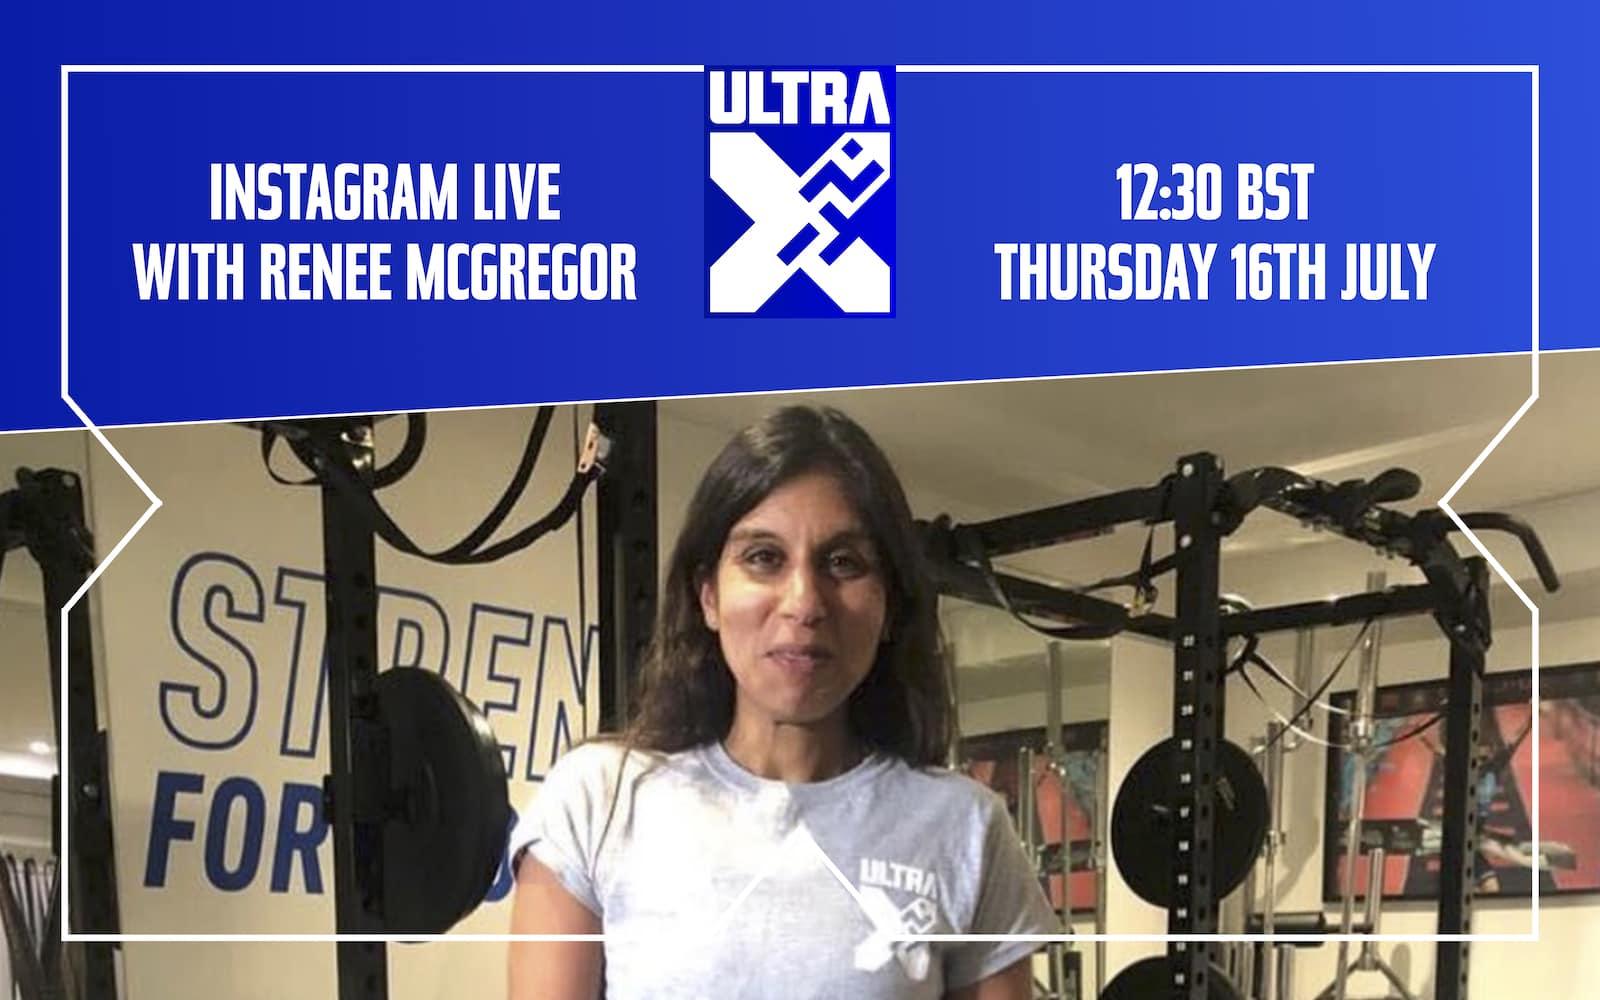 Instagram Live With Renee McGregor: Ultra Marathon Nutrition